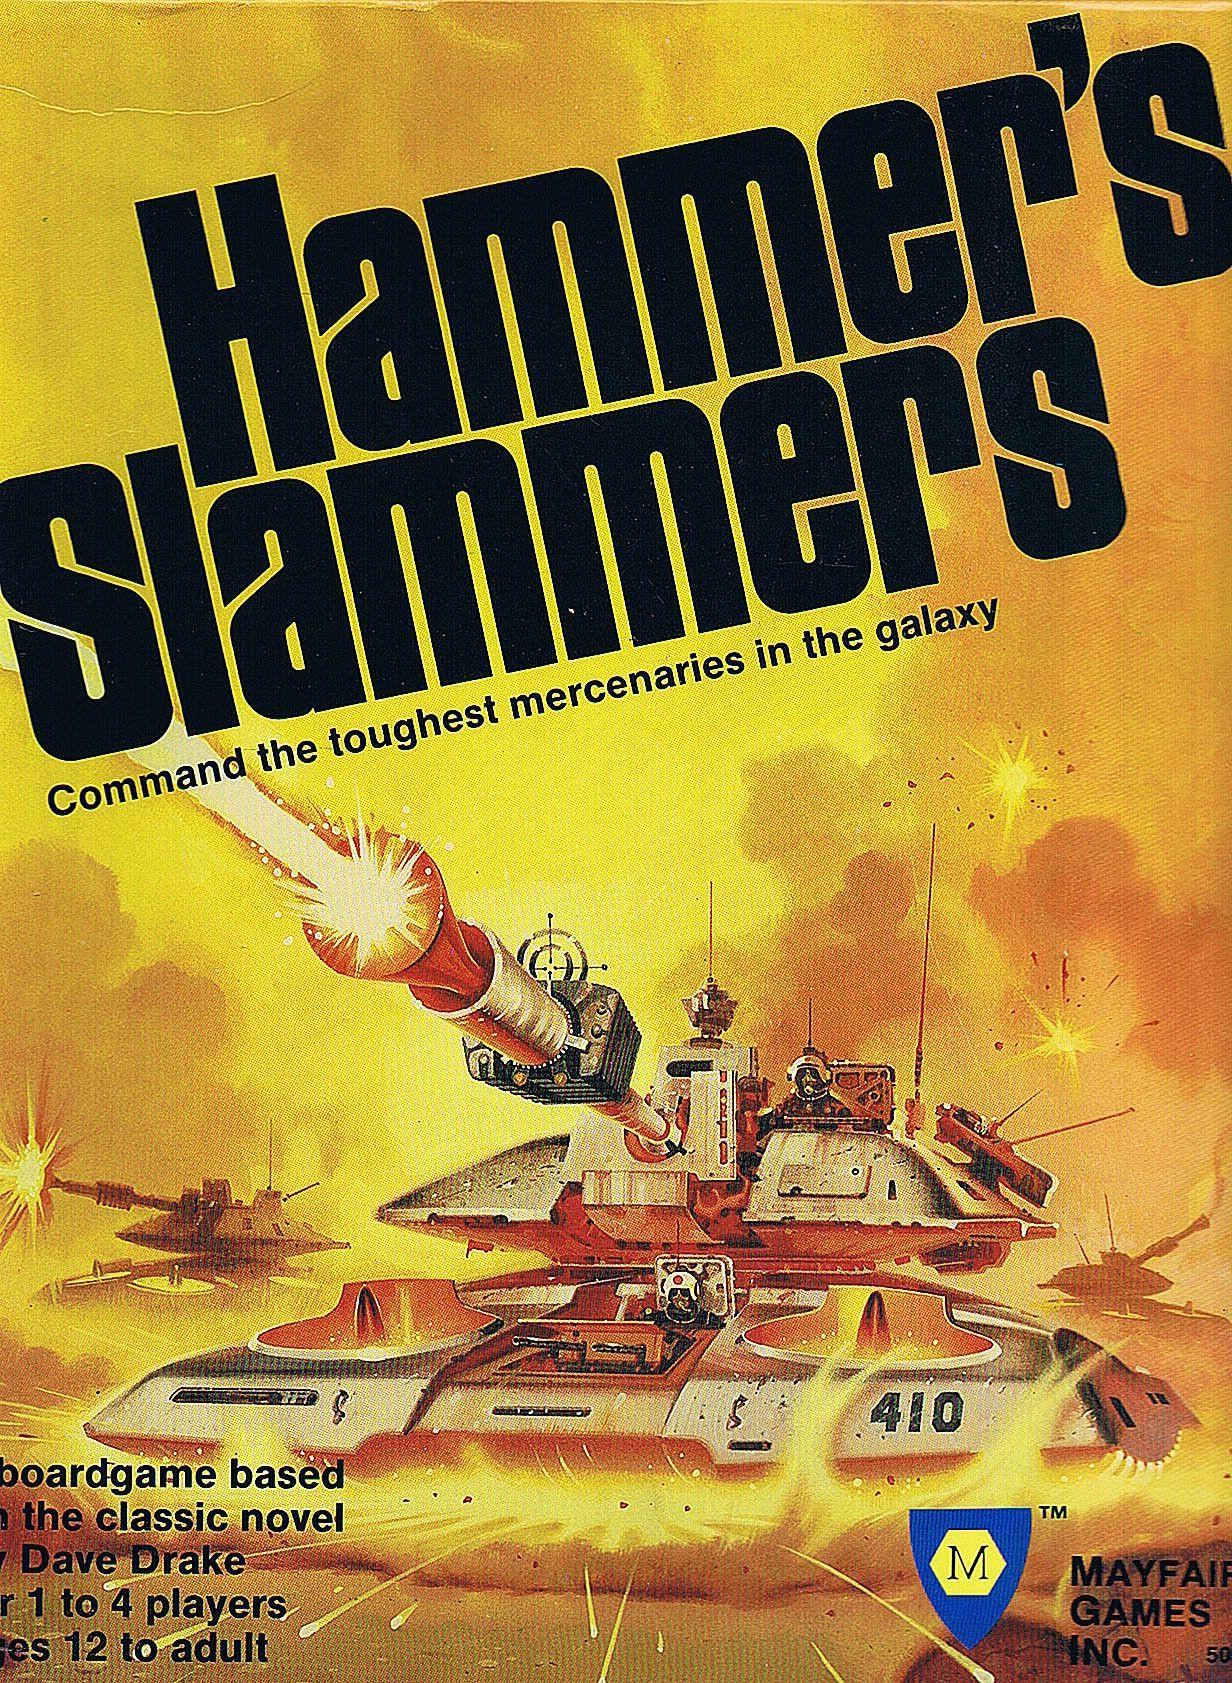 Hammers slammers image boardgamegeek board games